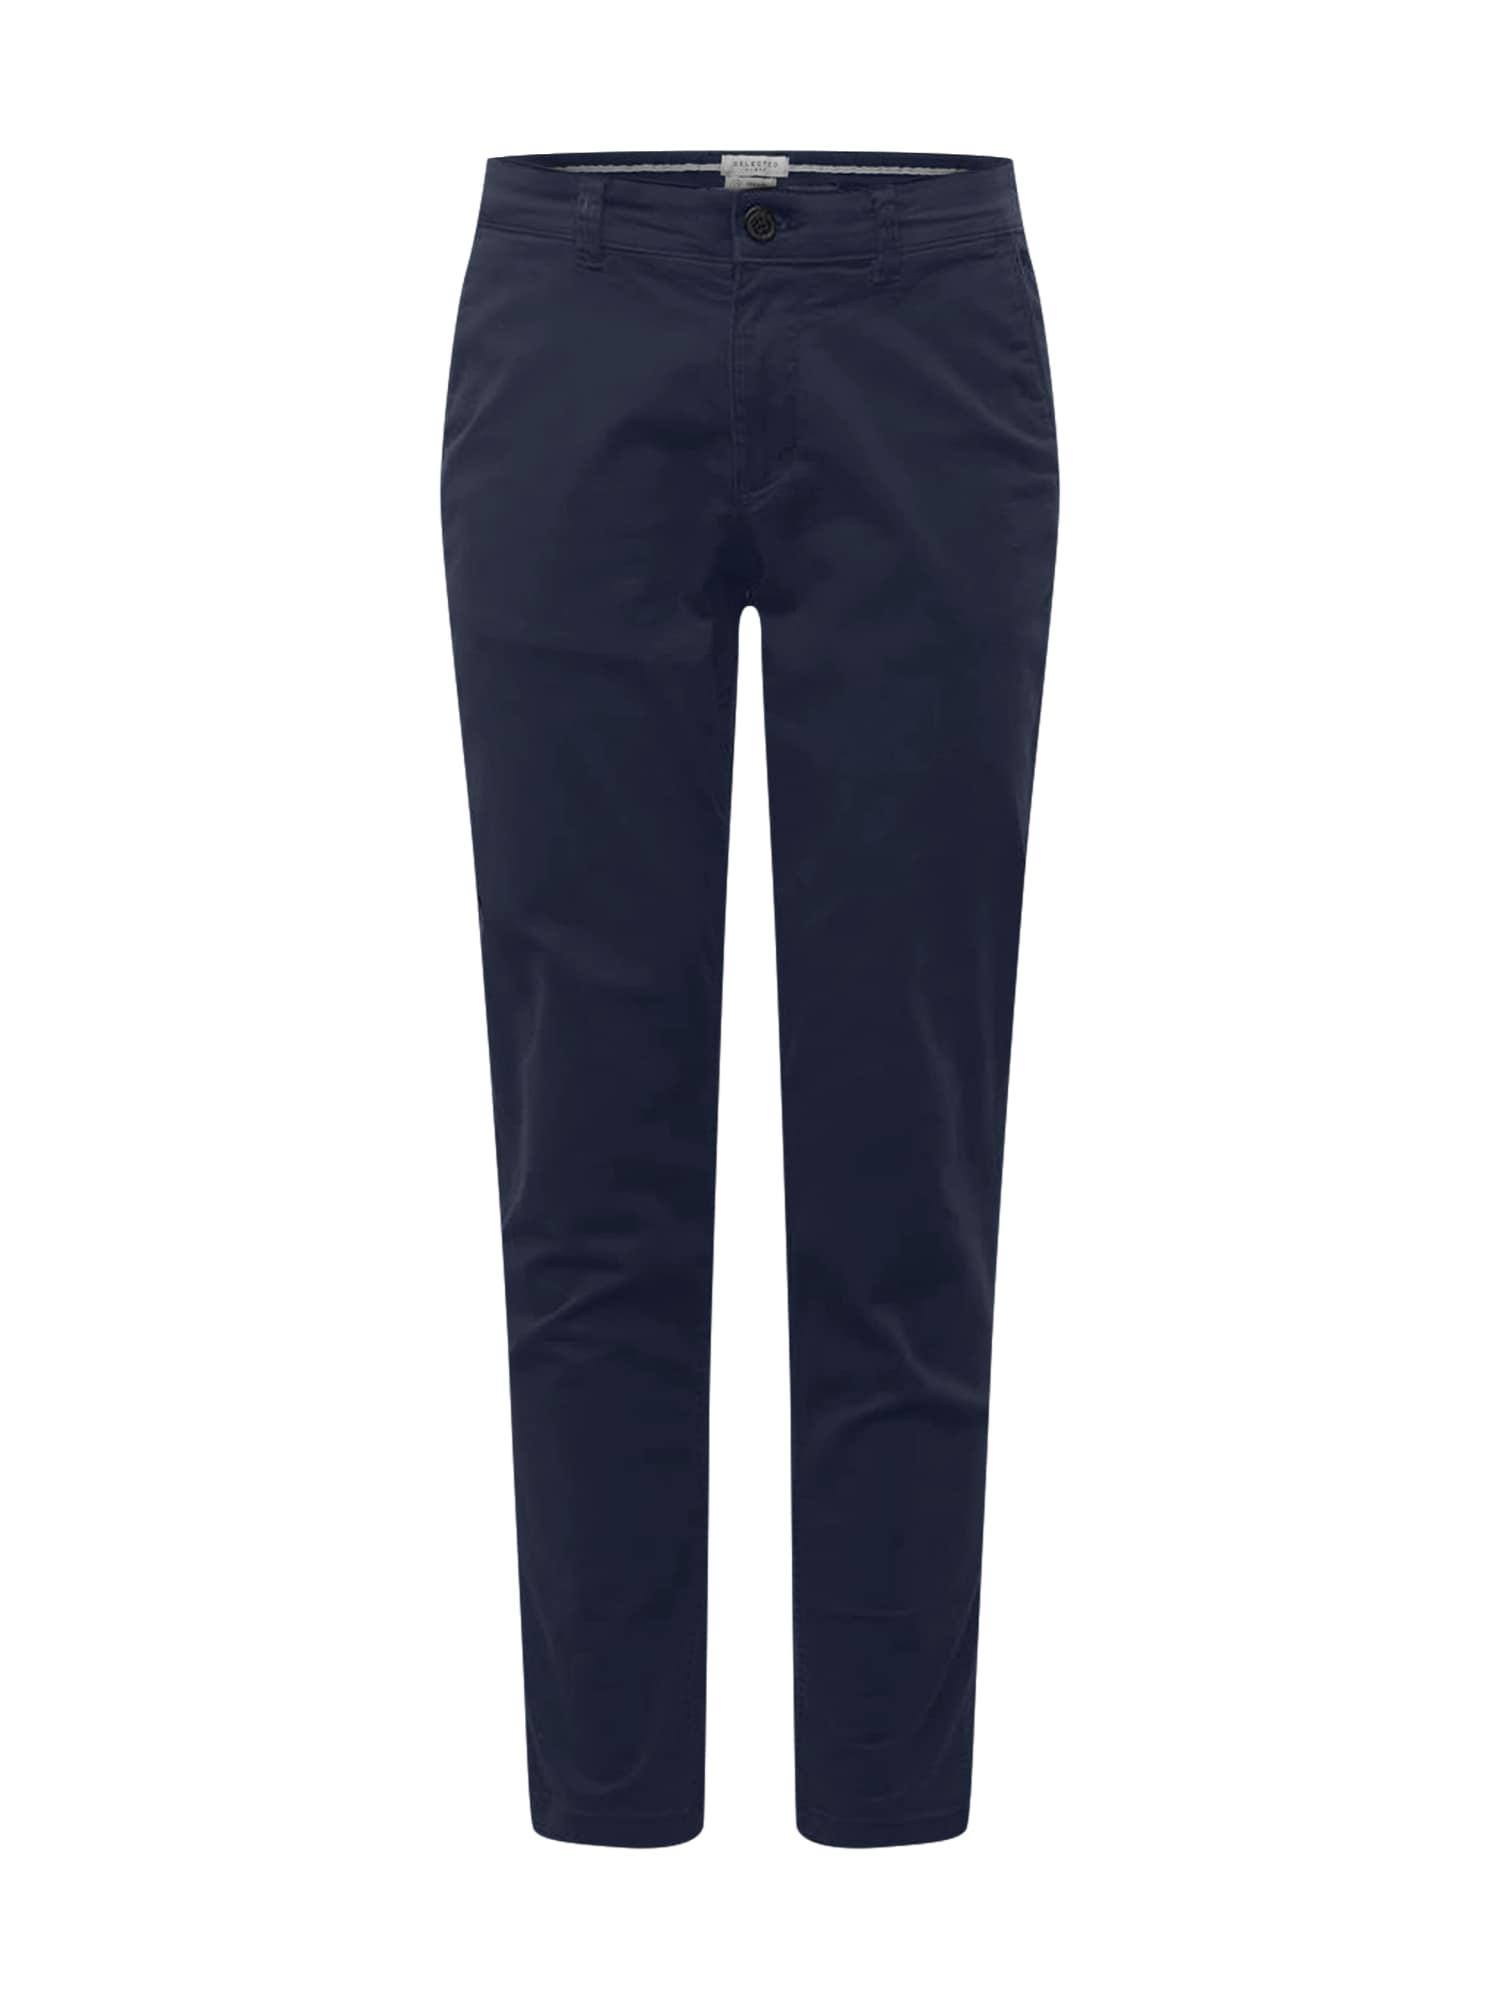 SELECTED HOMME Pantalon chino 'NEW PARIS'  - Bleu - Taille: 33 - male